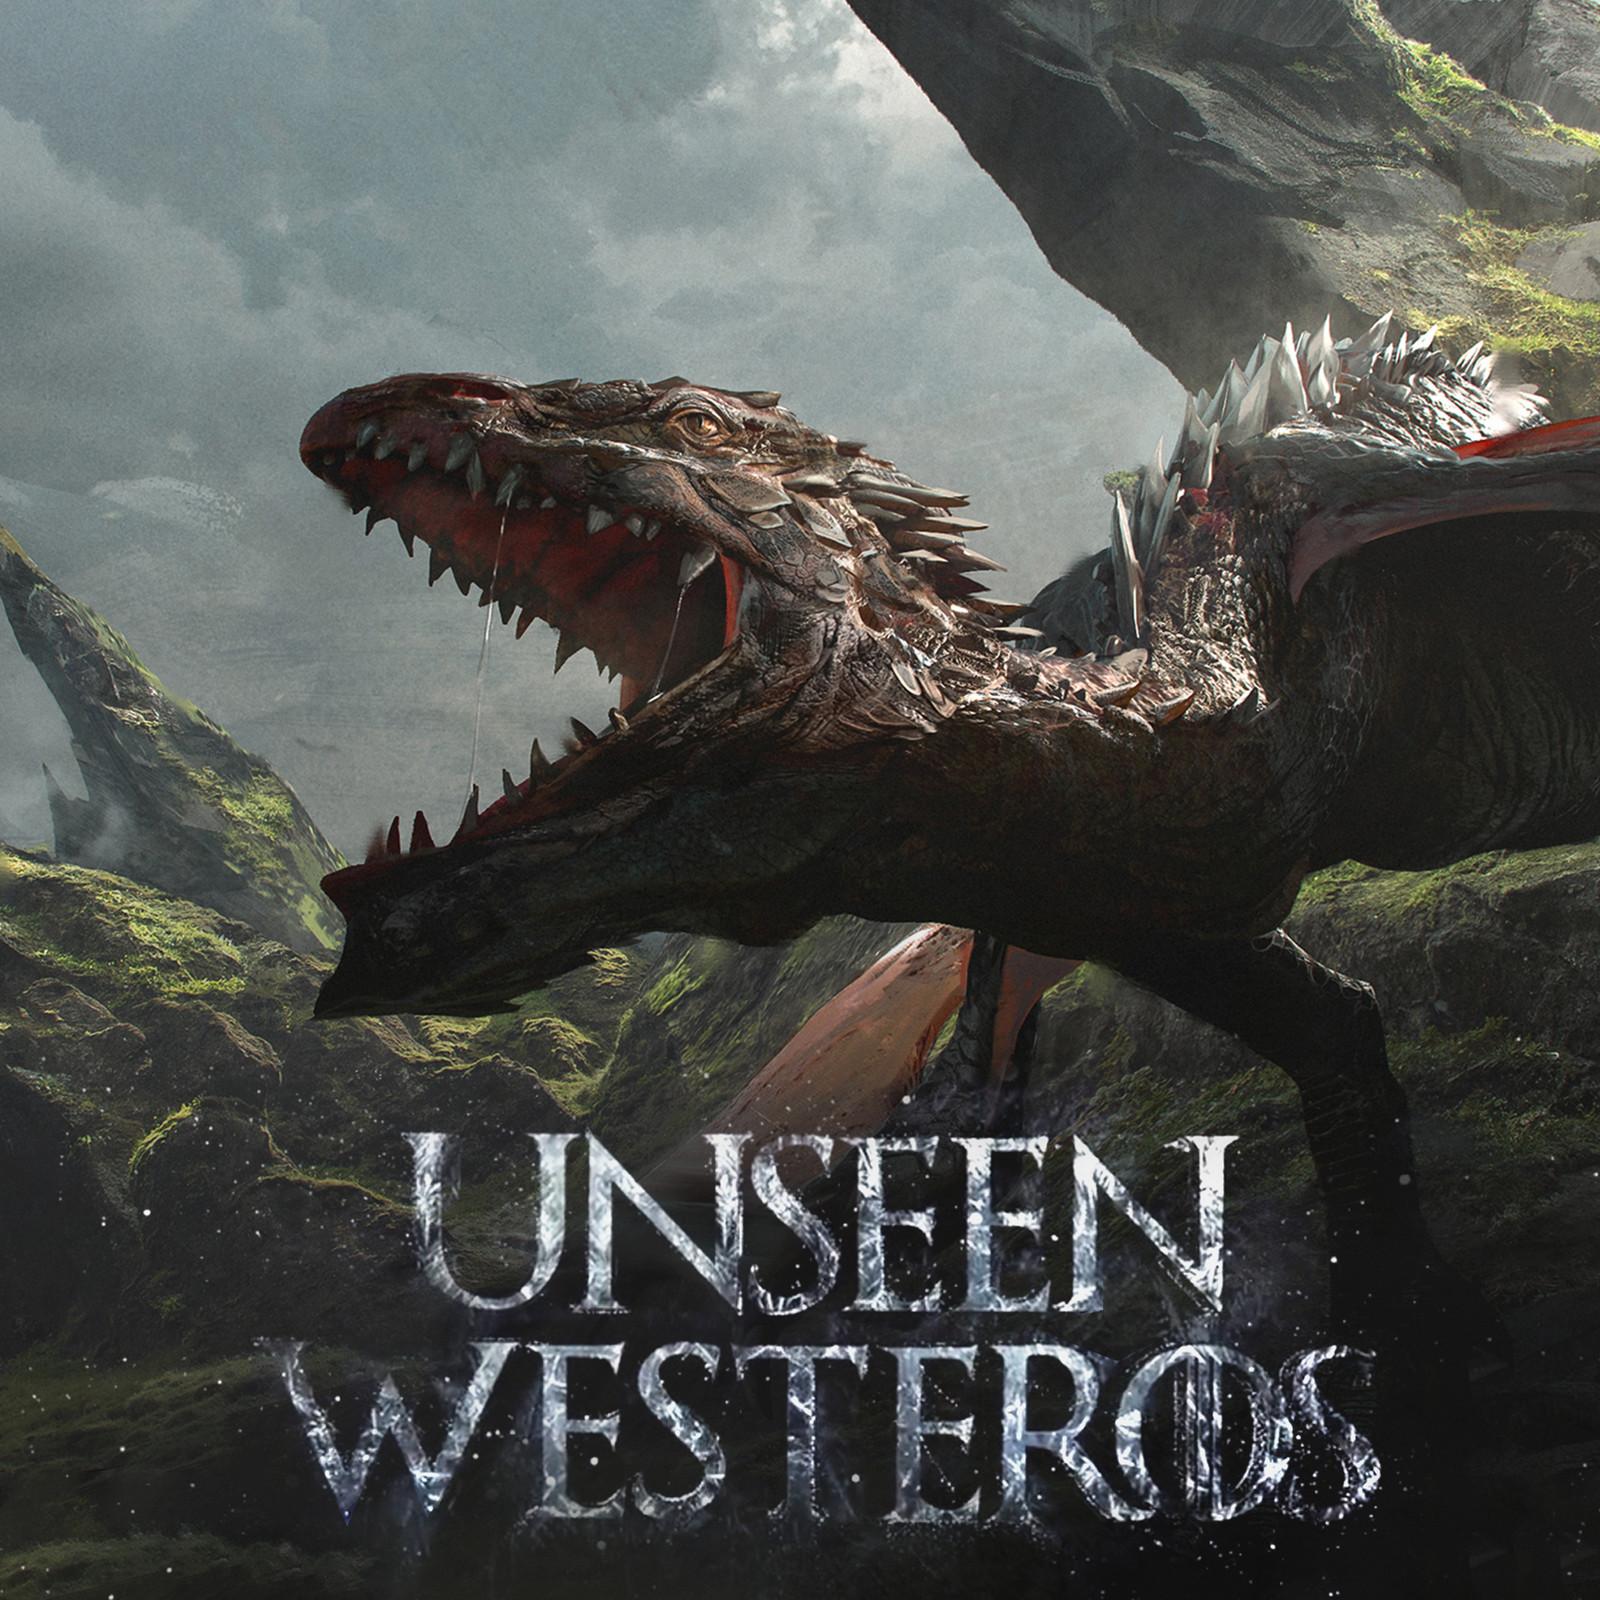 UNSEEN WESTEROS / Sothoryos